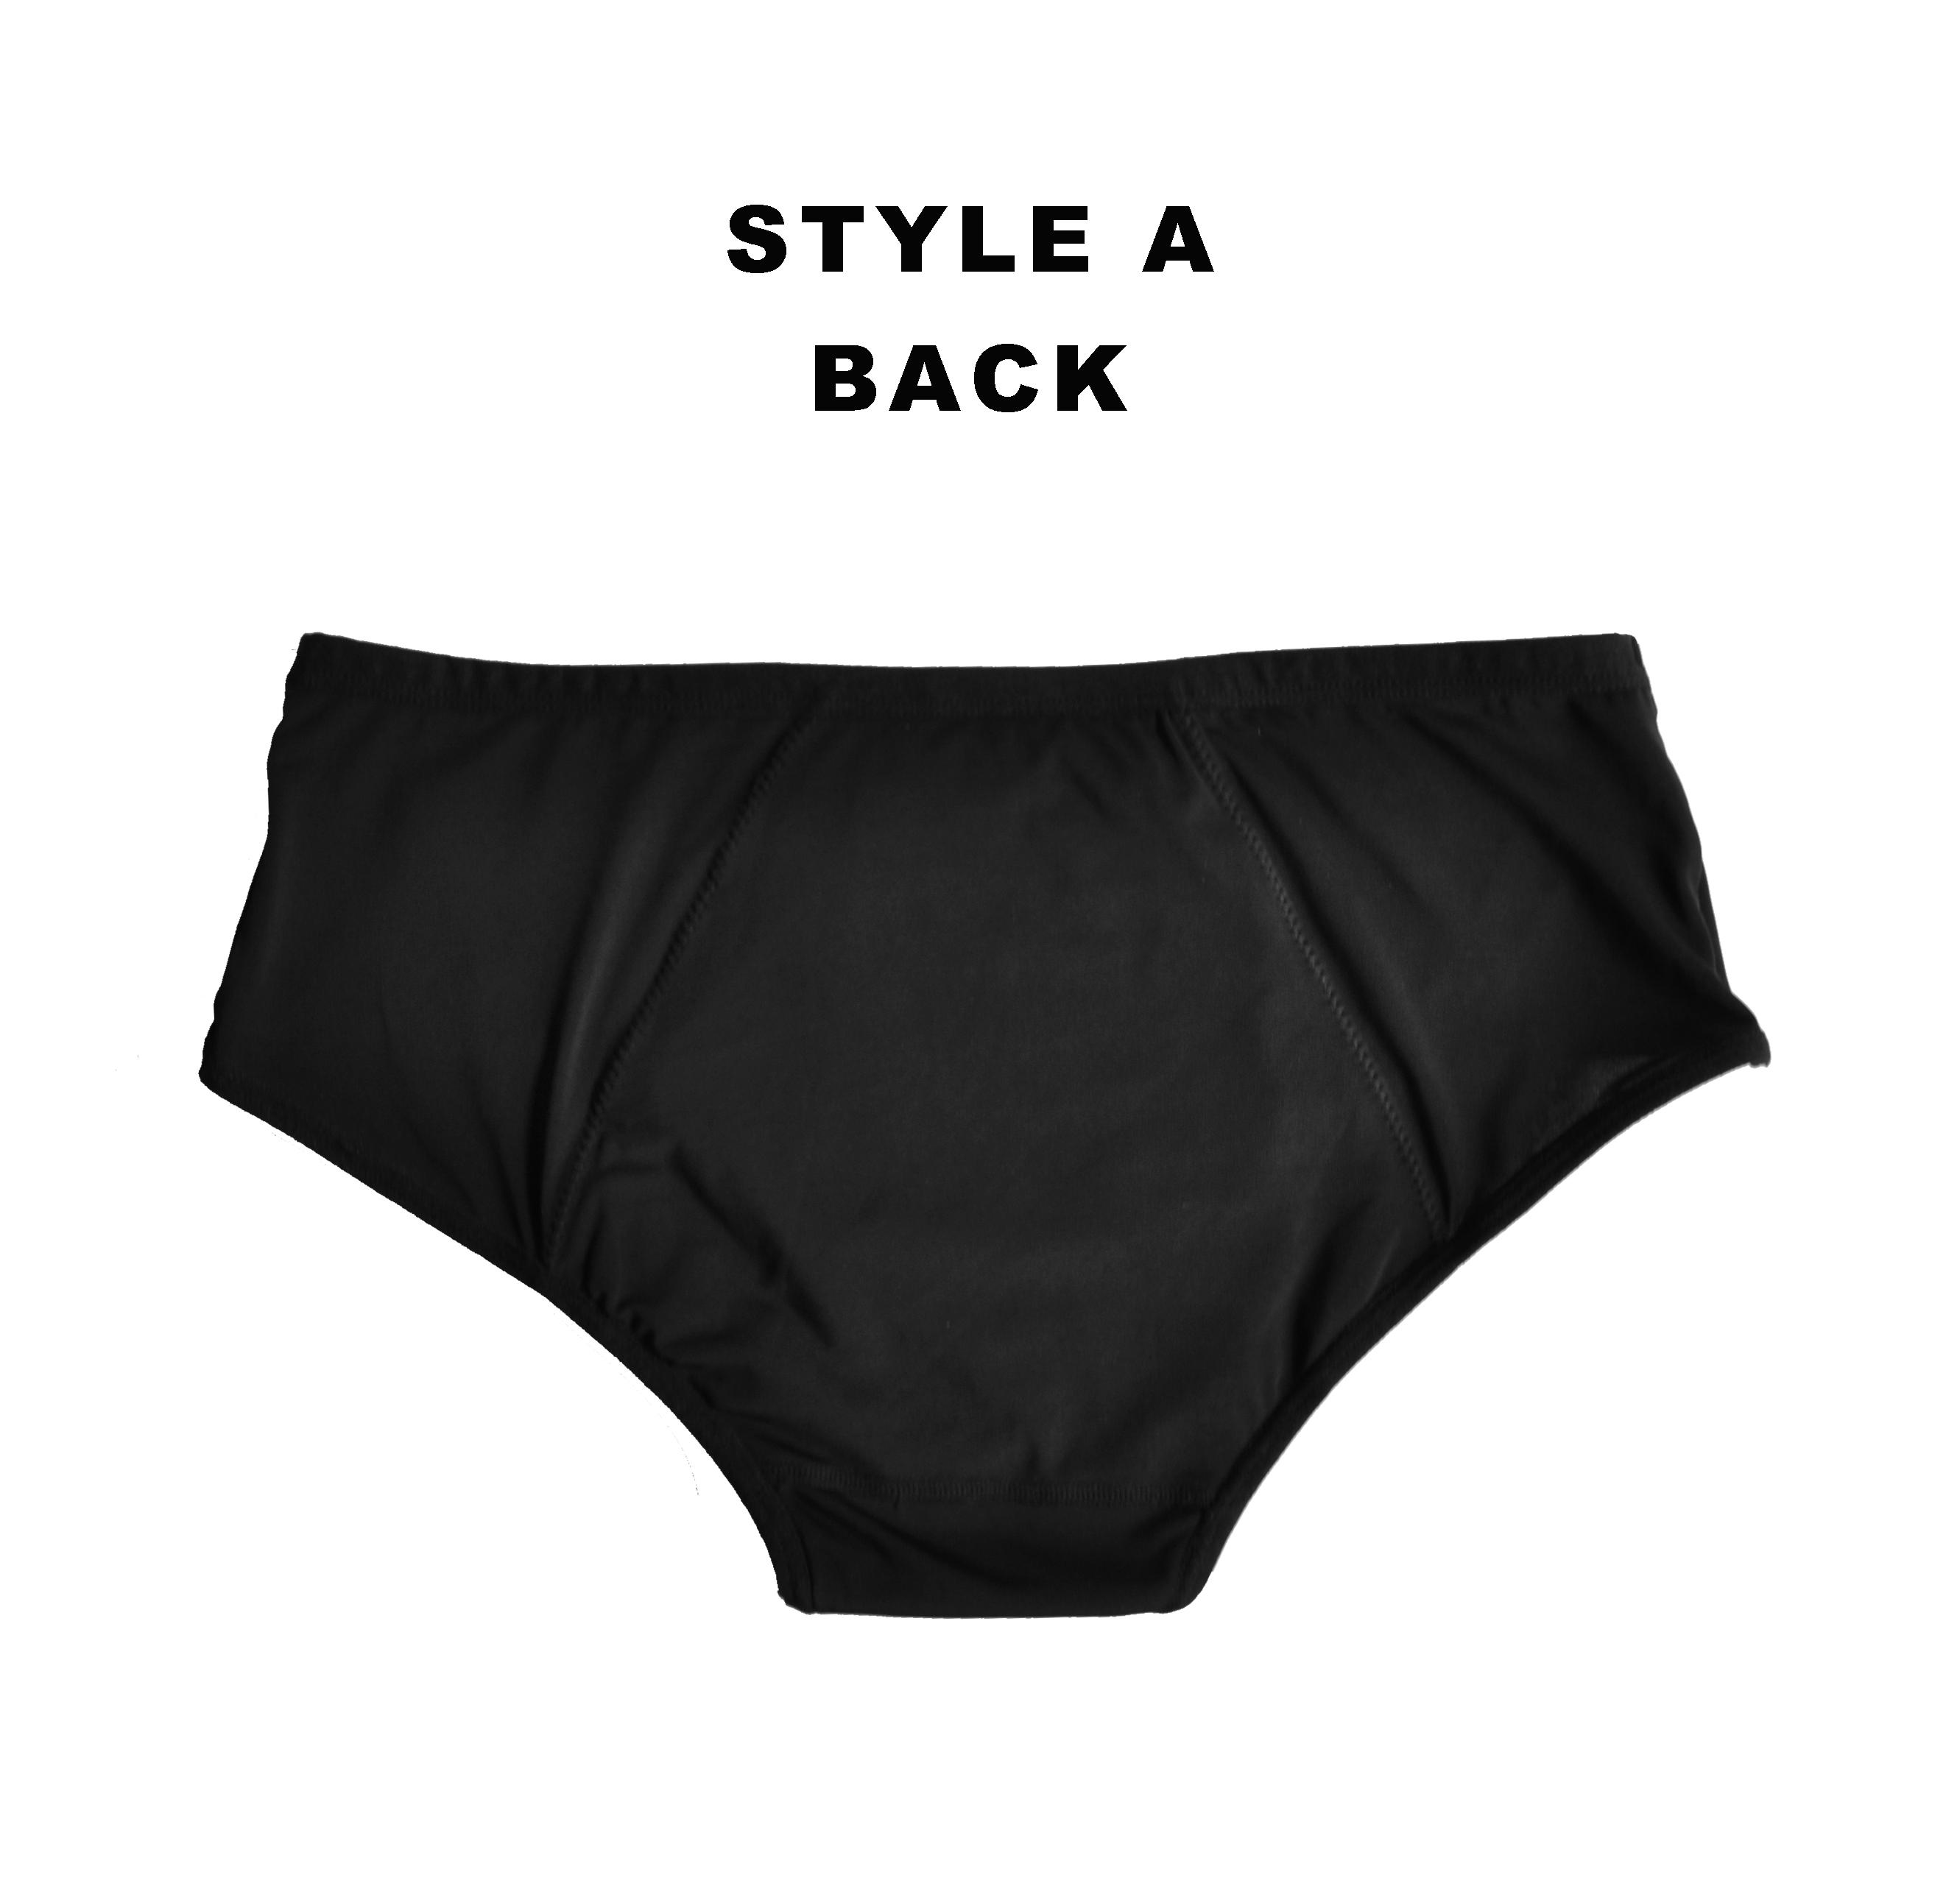 Multi layers cotton menstrual period panties washable reusable sanitary panties leak proof panty panties underwear фото